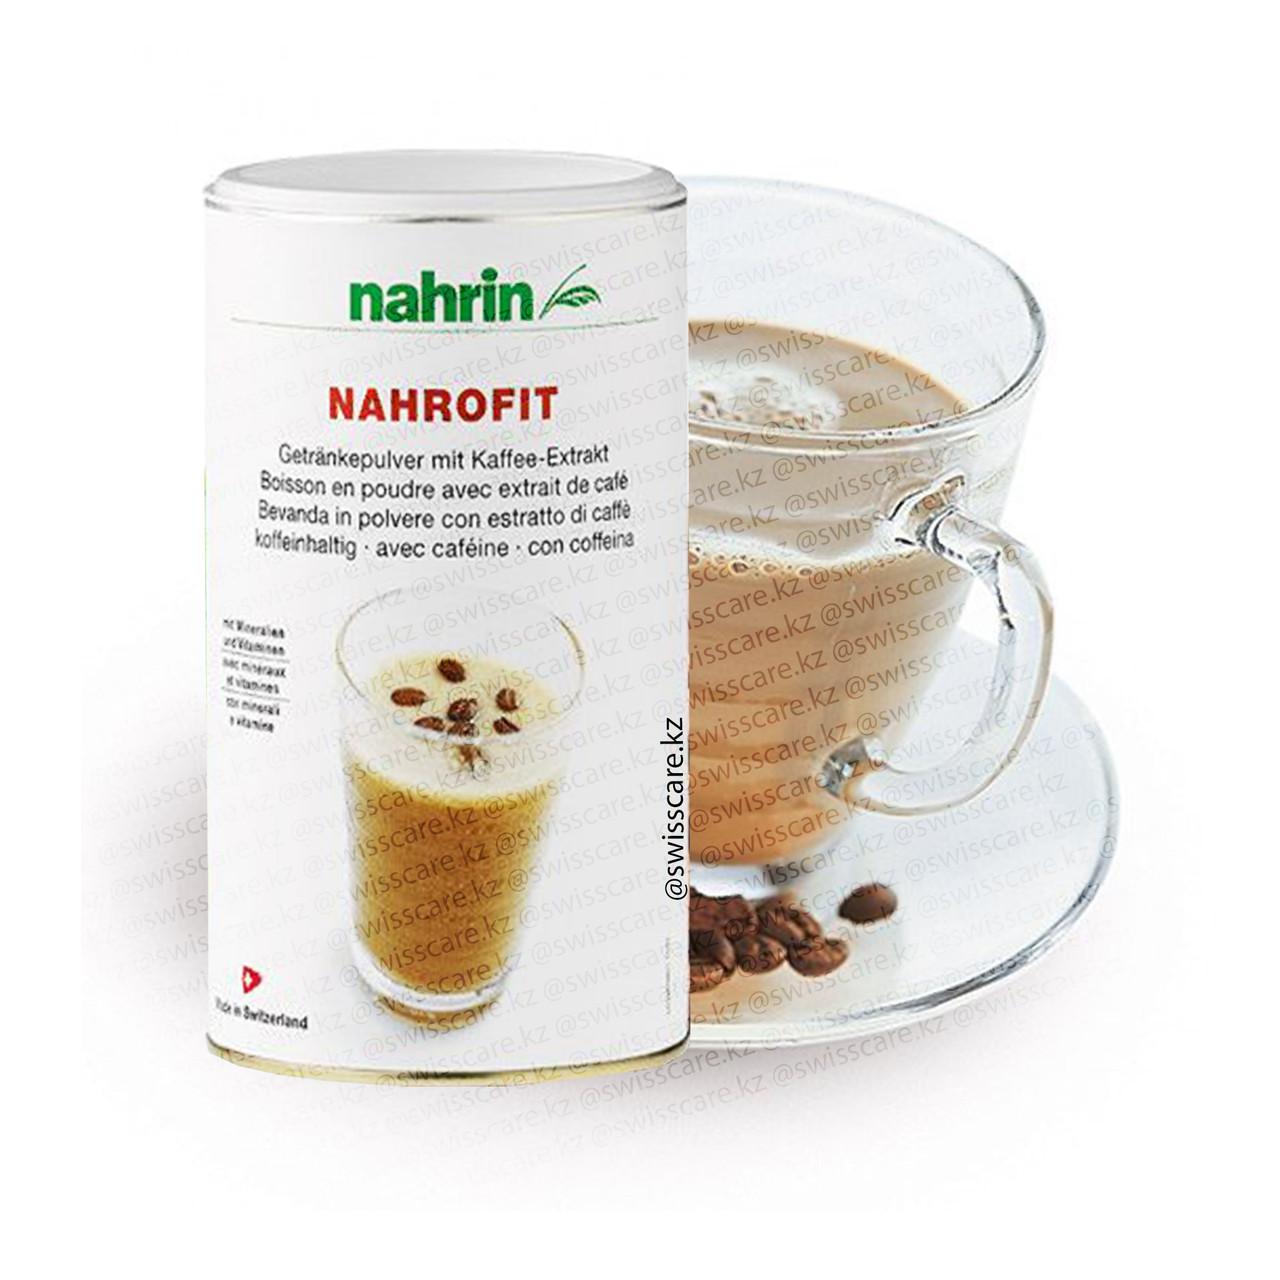 Коктейль Нарофит Кофе Нарин Nahrin (Оригинал-Швейцария)